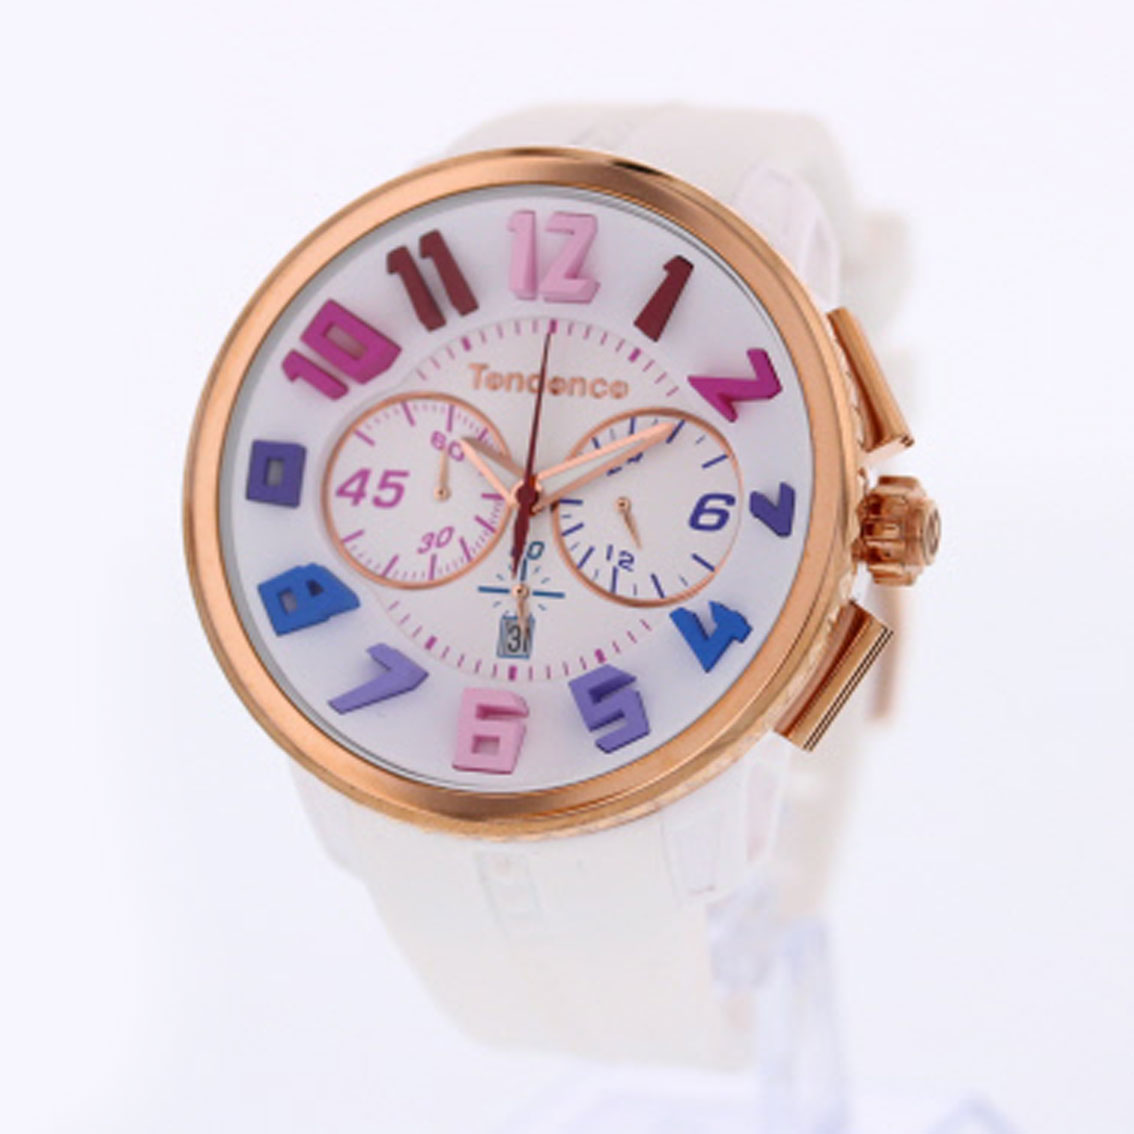 TENDENCE / テンデンス Round Gulliver / ラウンドガリバー TY460614腕時計 メンズ 【あす楽対応_東海】